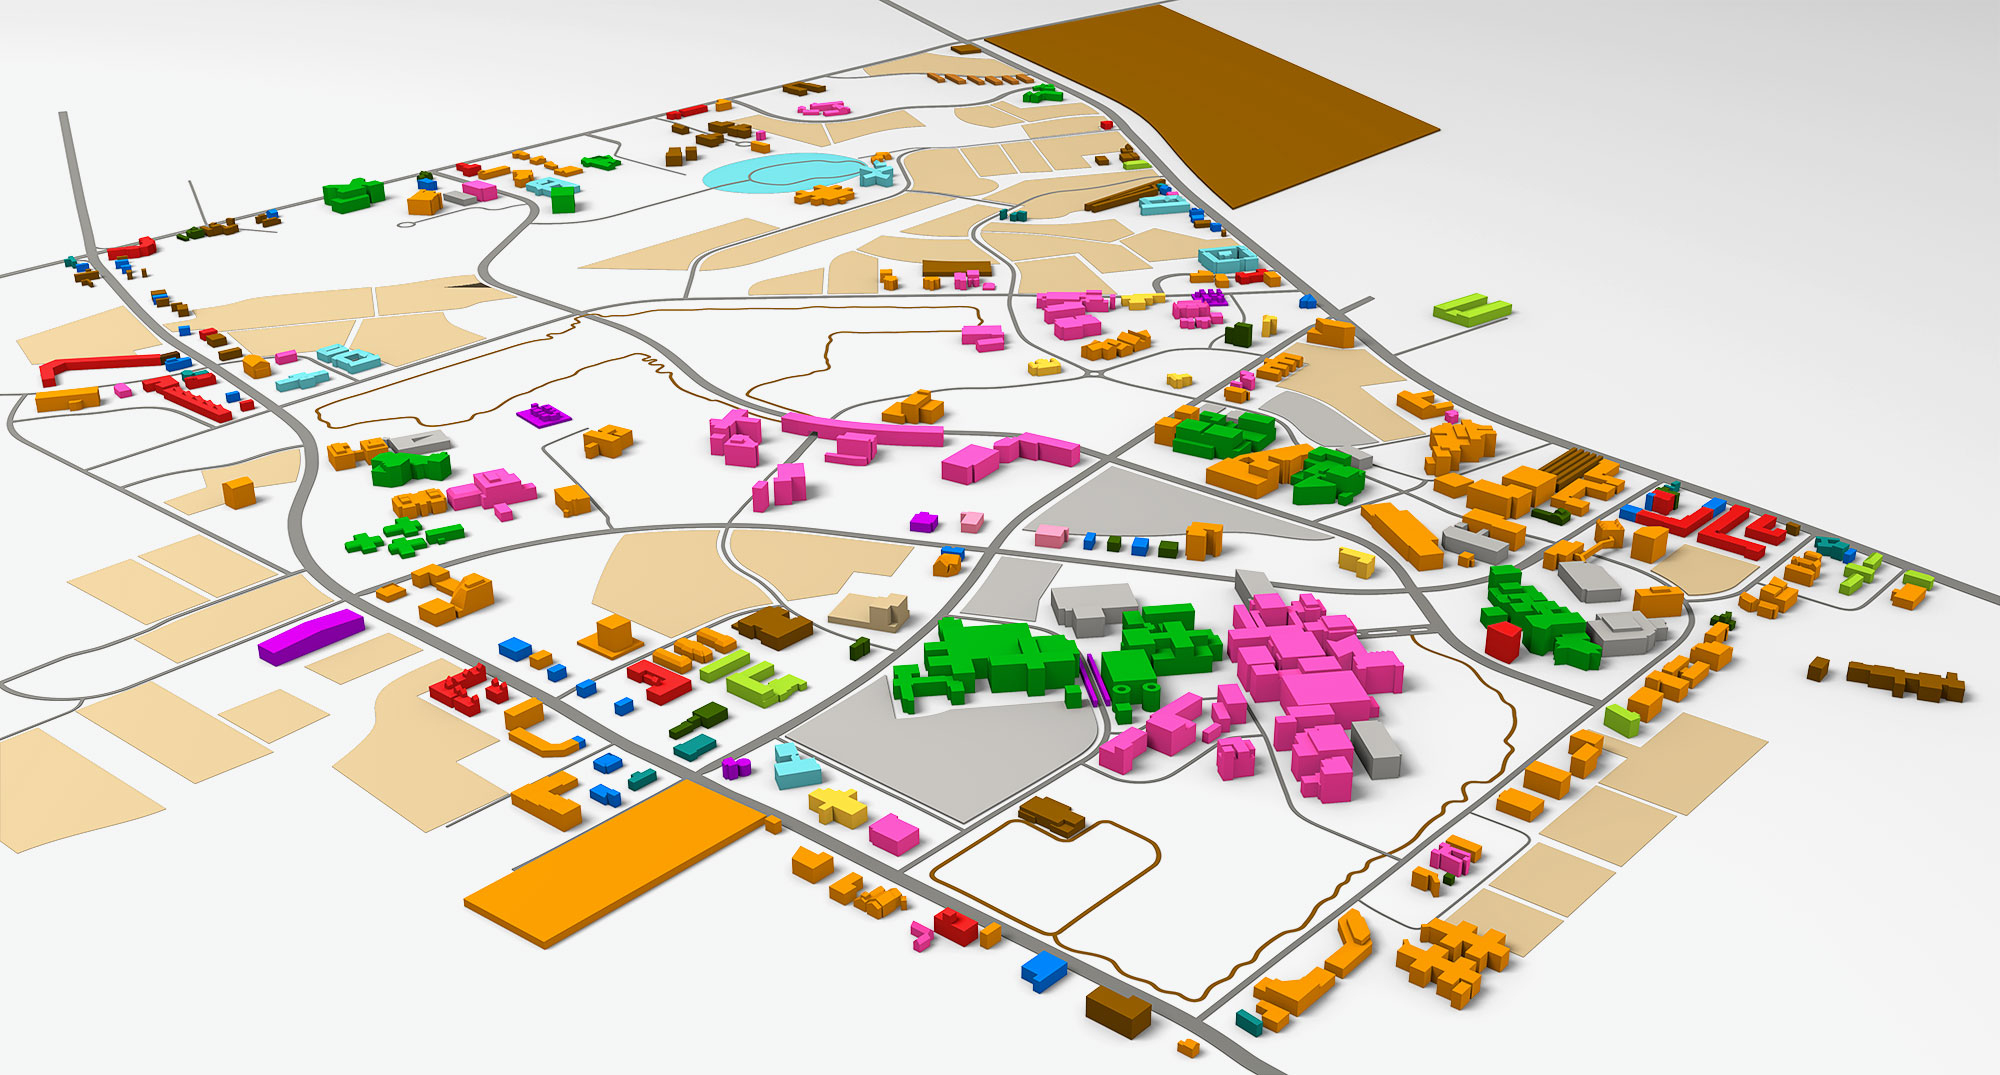 South Texas Medical Center Map   Pixelnate - Texas Medical Center Map